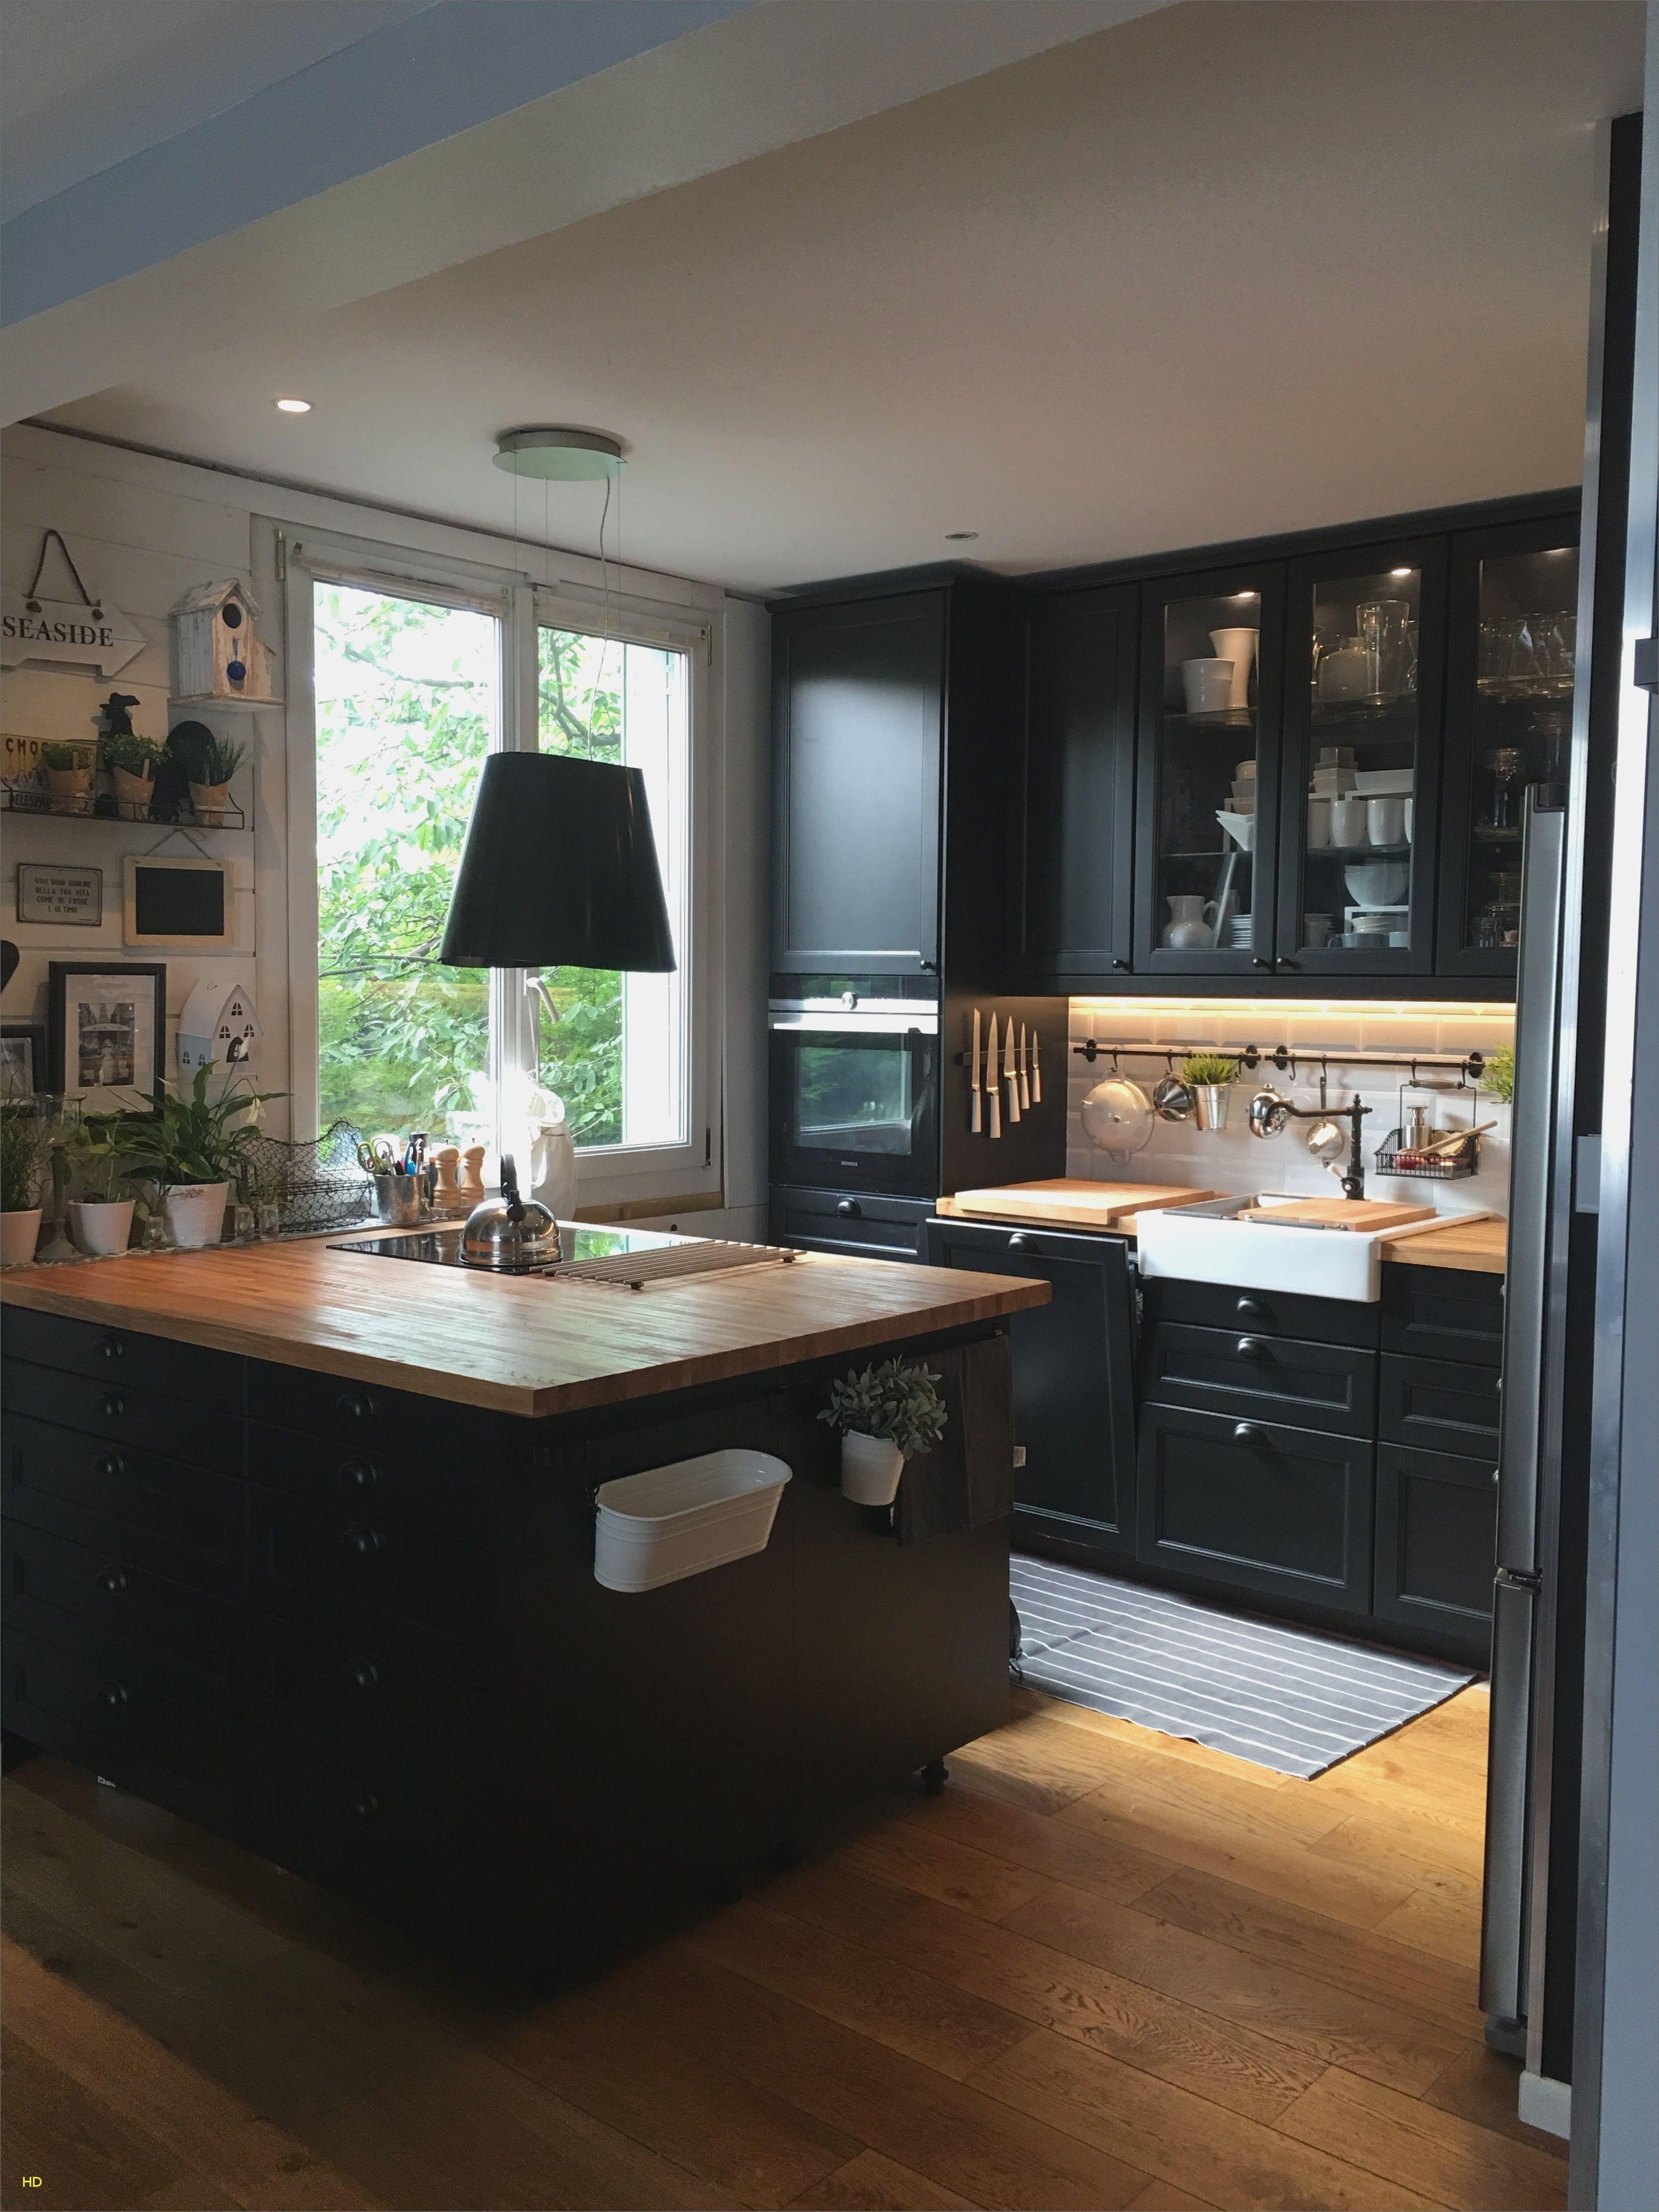 Best Of Cuisine Noir Et Plan De Travail Bois Kitchen Design Interior Design Kitchen Home Decor Kitchen